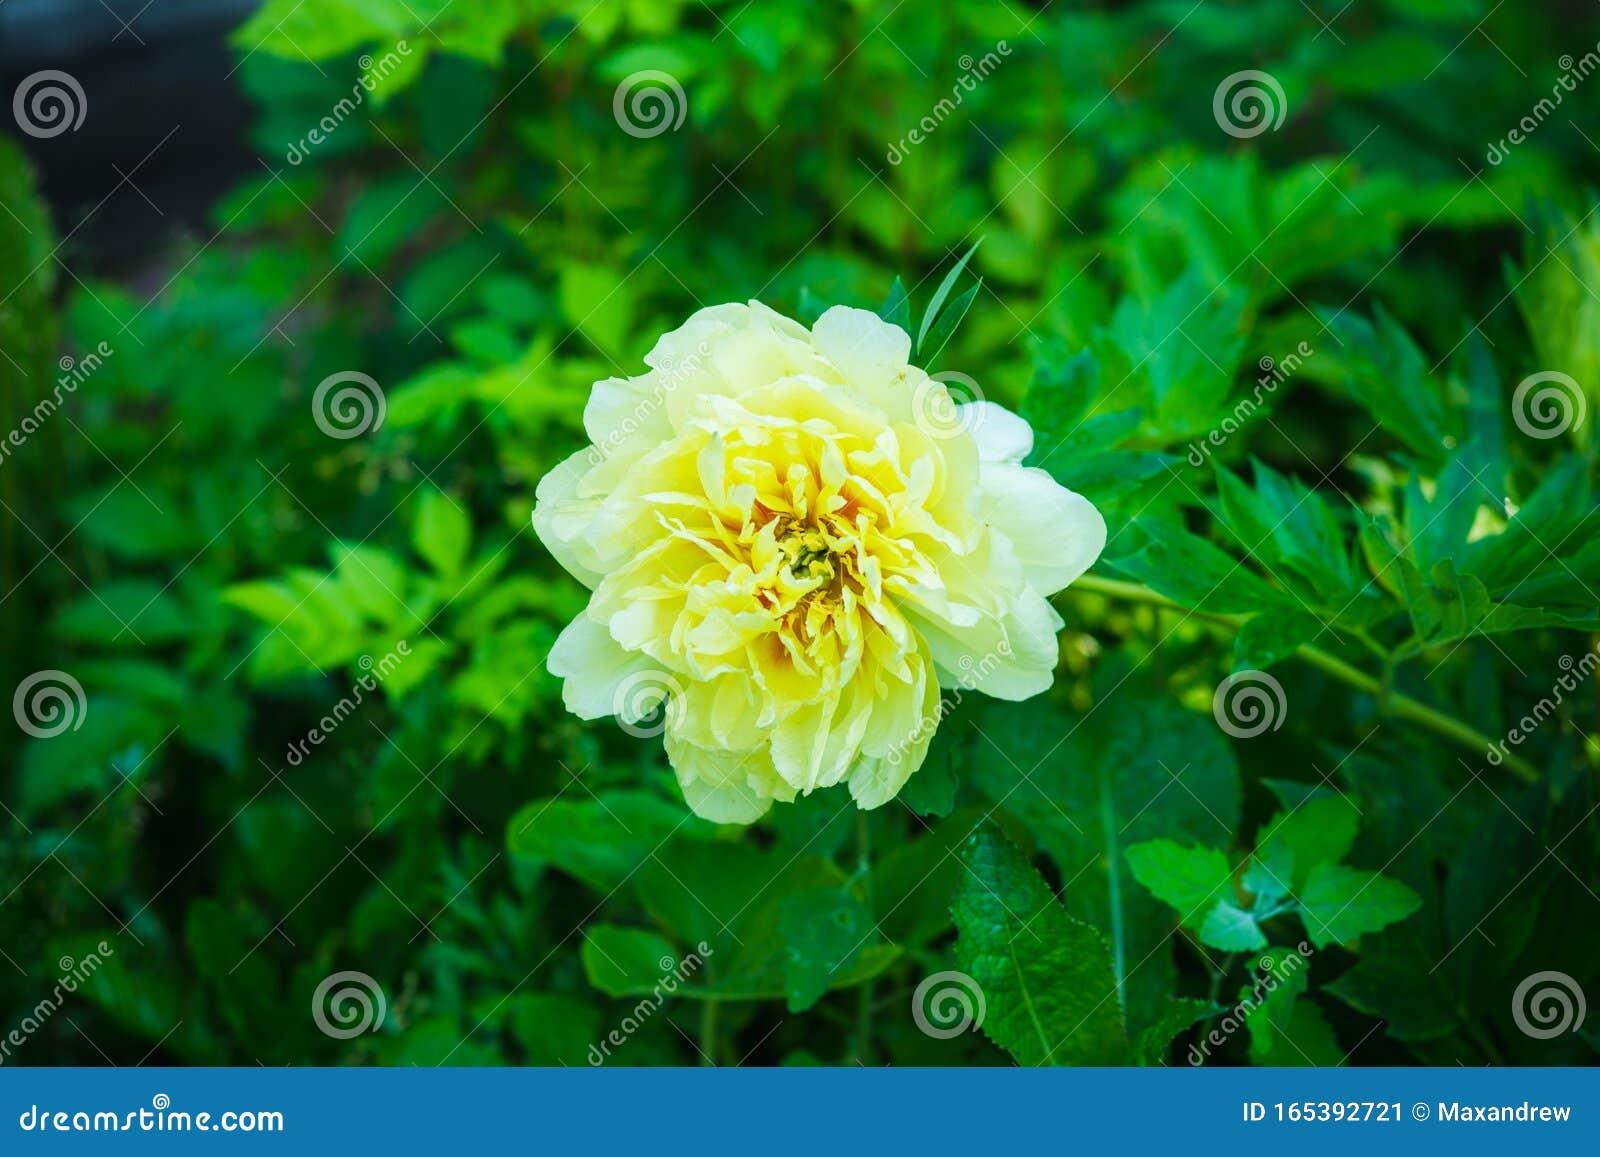 Blooming Yellow Peony Garden Treasure In The Garden Stock Image